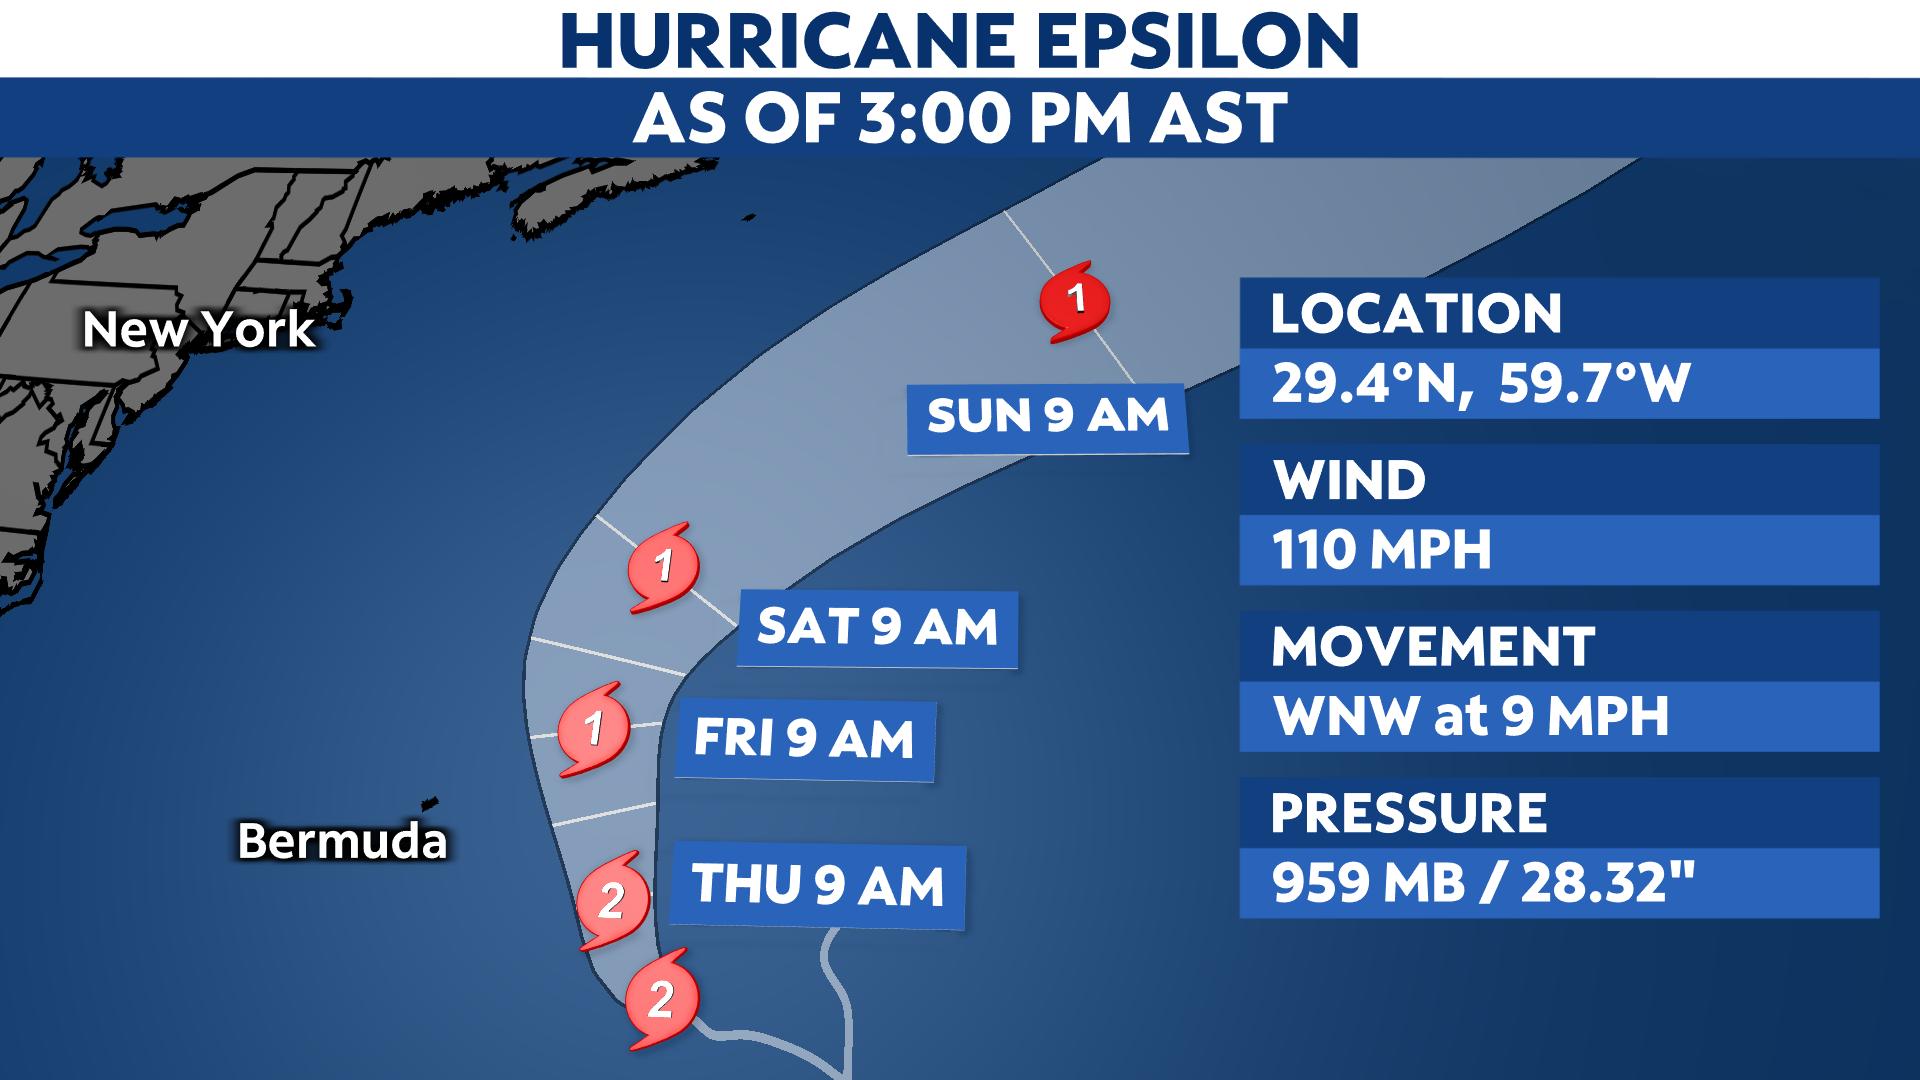 Hurricane Epsilon Becomes 4th Major Hurricane of 2020